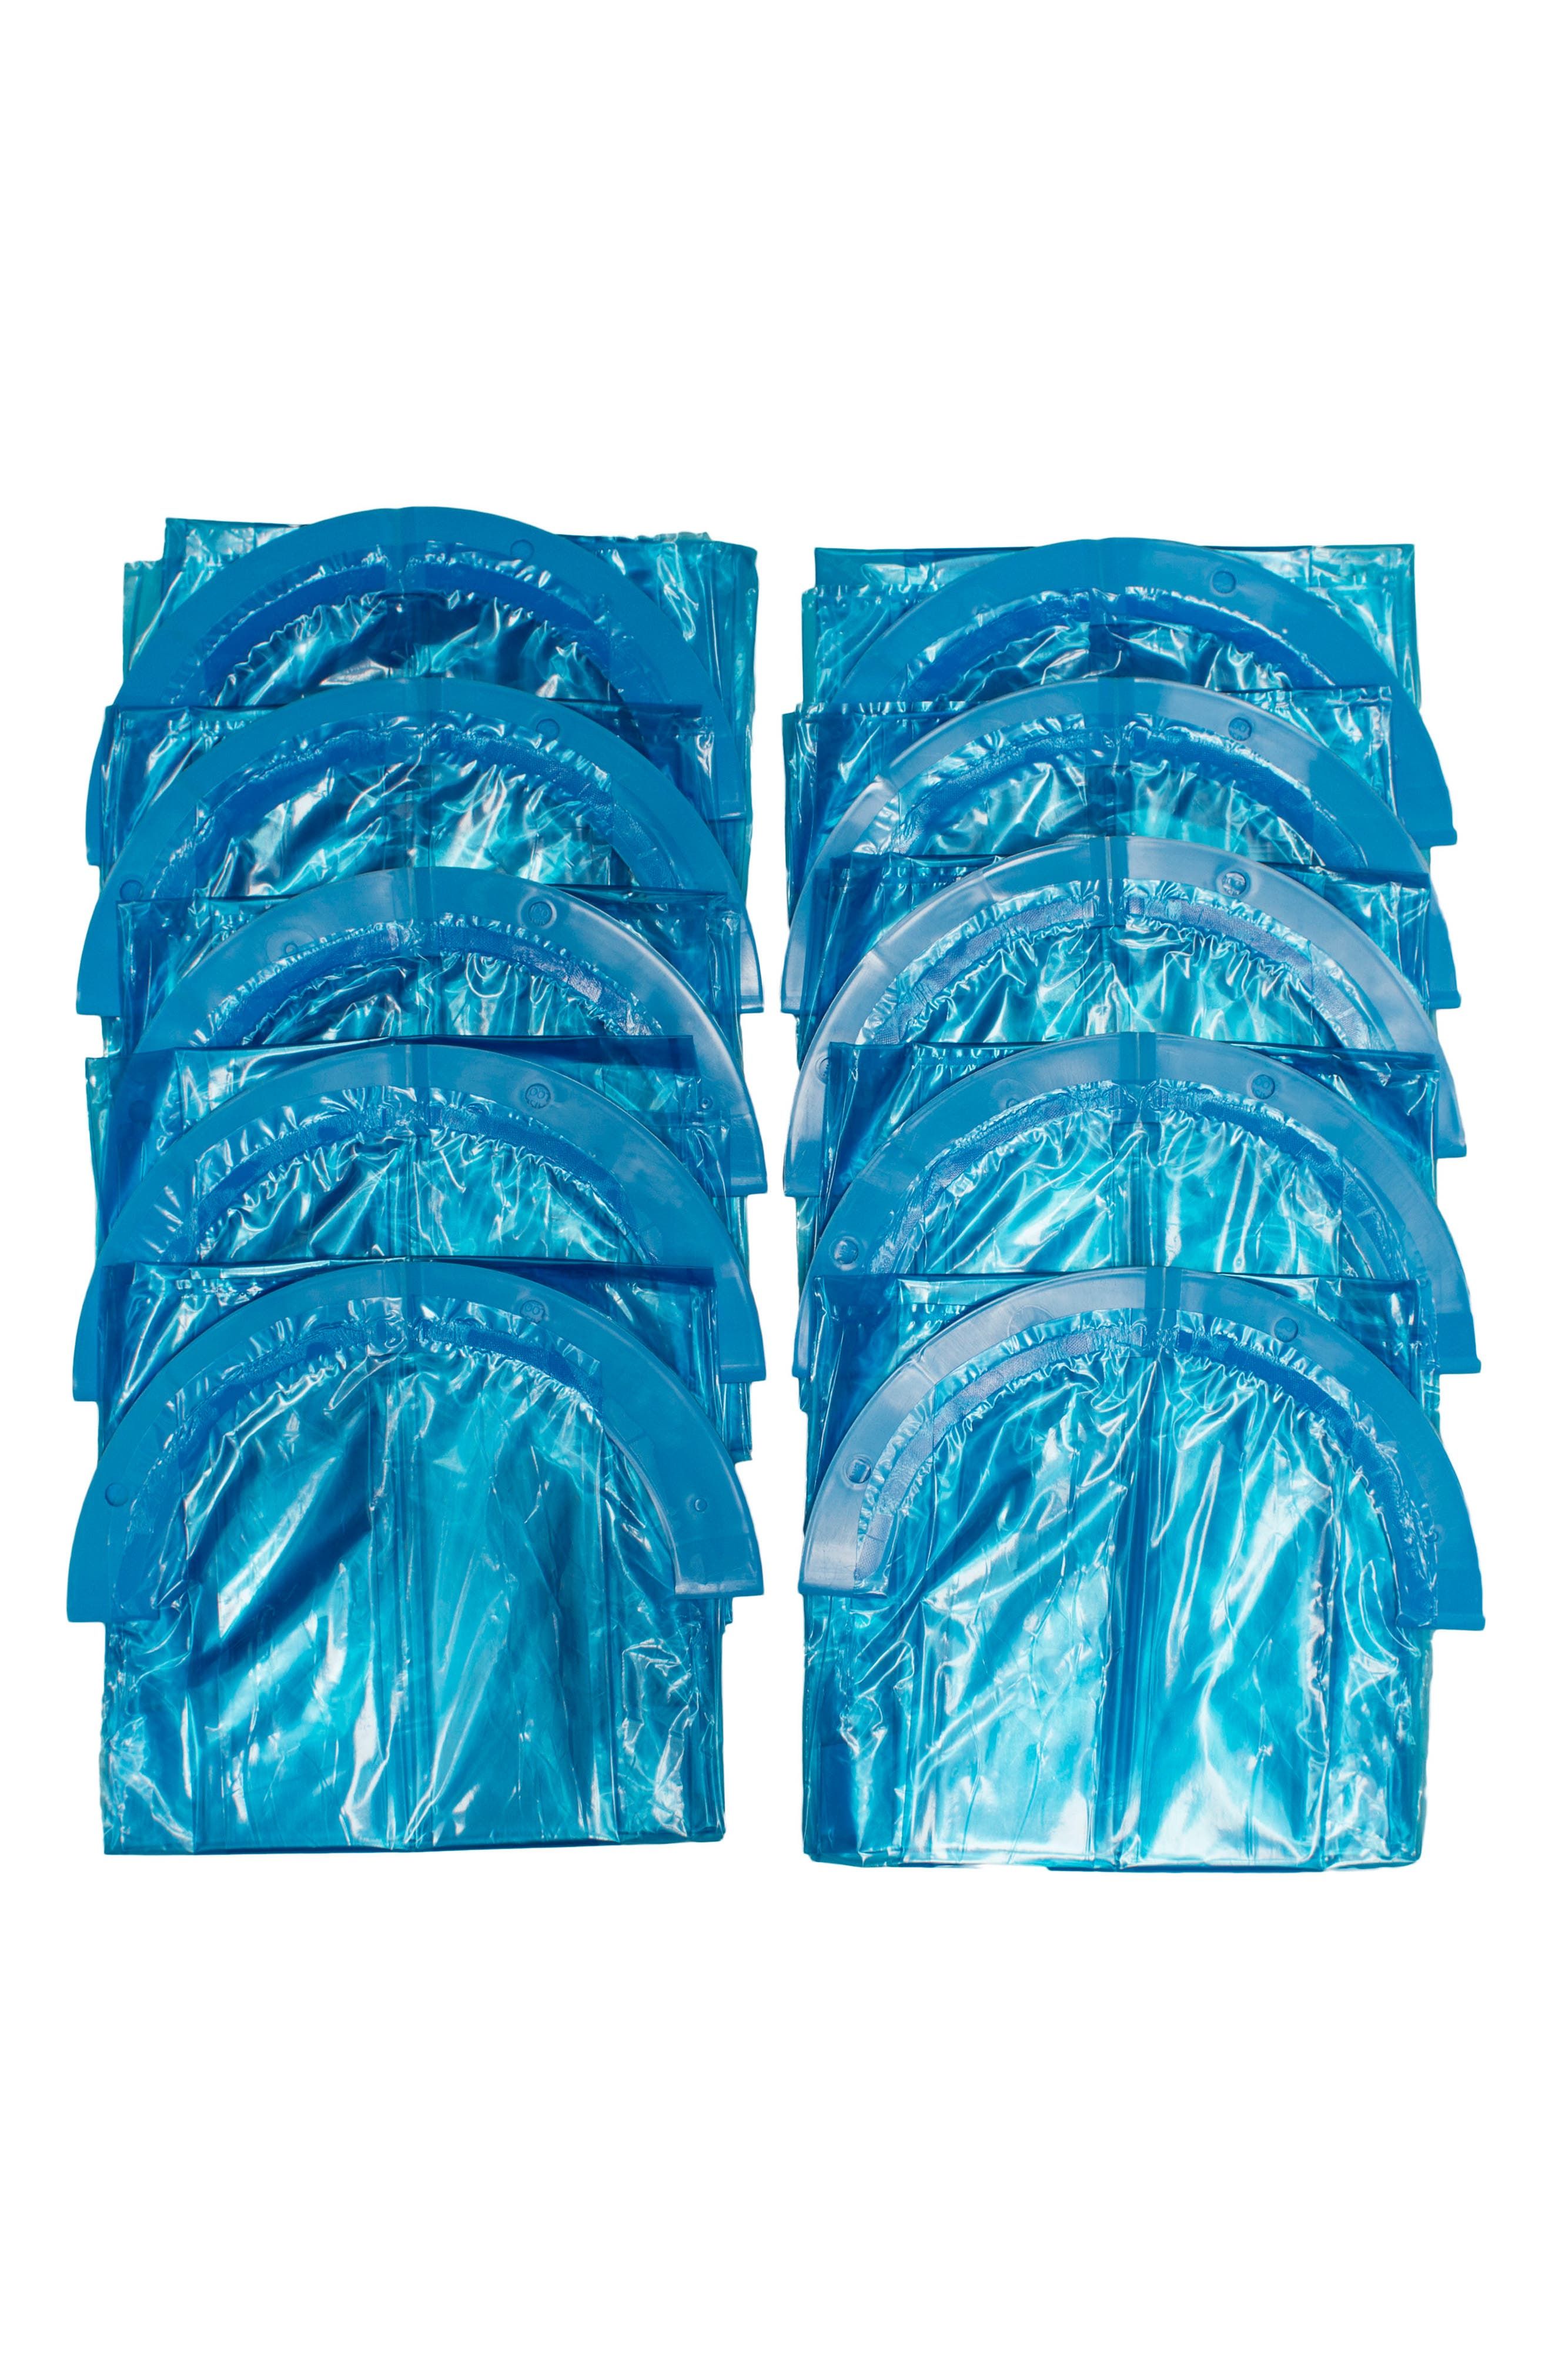 Twist'r Diaper Disposal System Set of 10 Refill Bags,                             Main thumbnail 1, color,